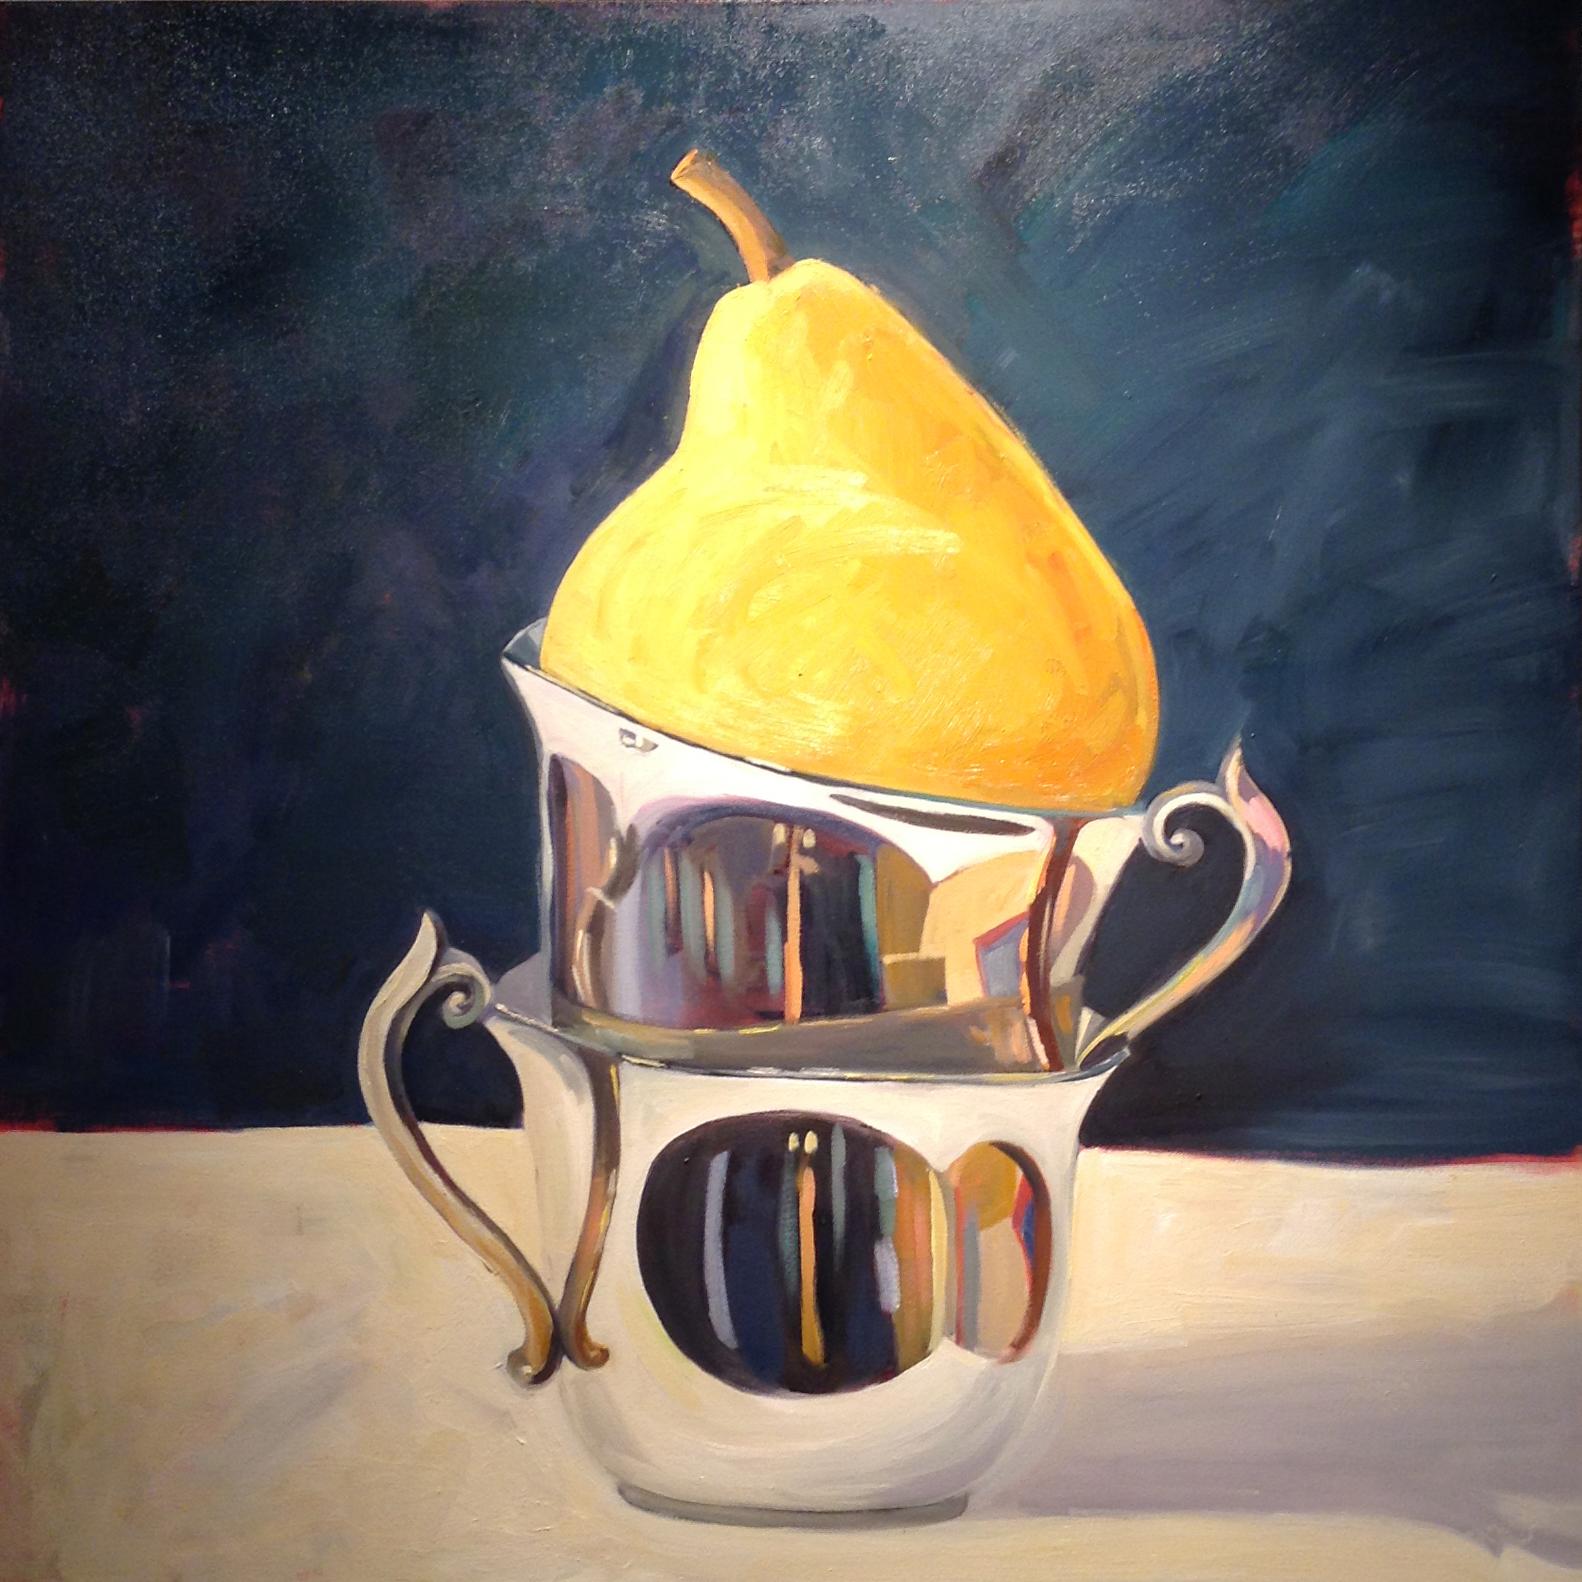 reflective pears 48x48in. $3200.jpg